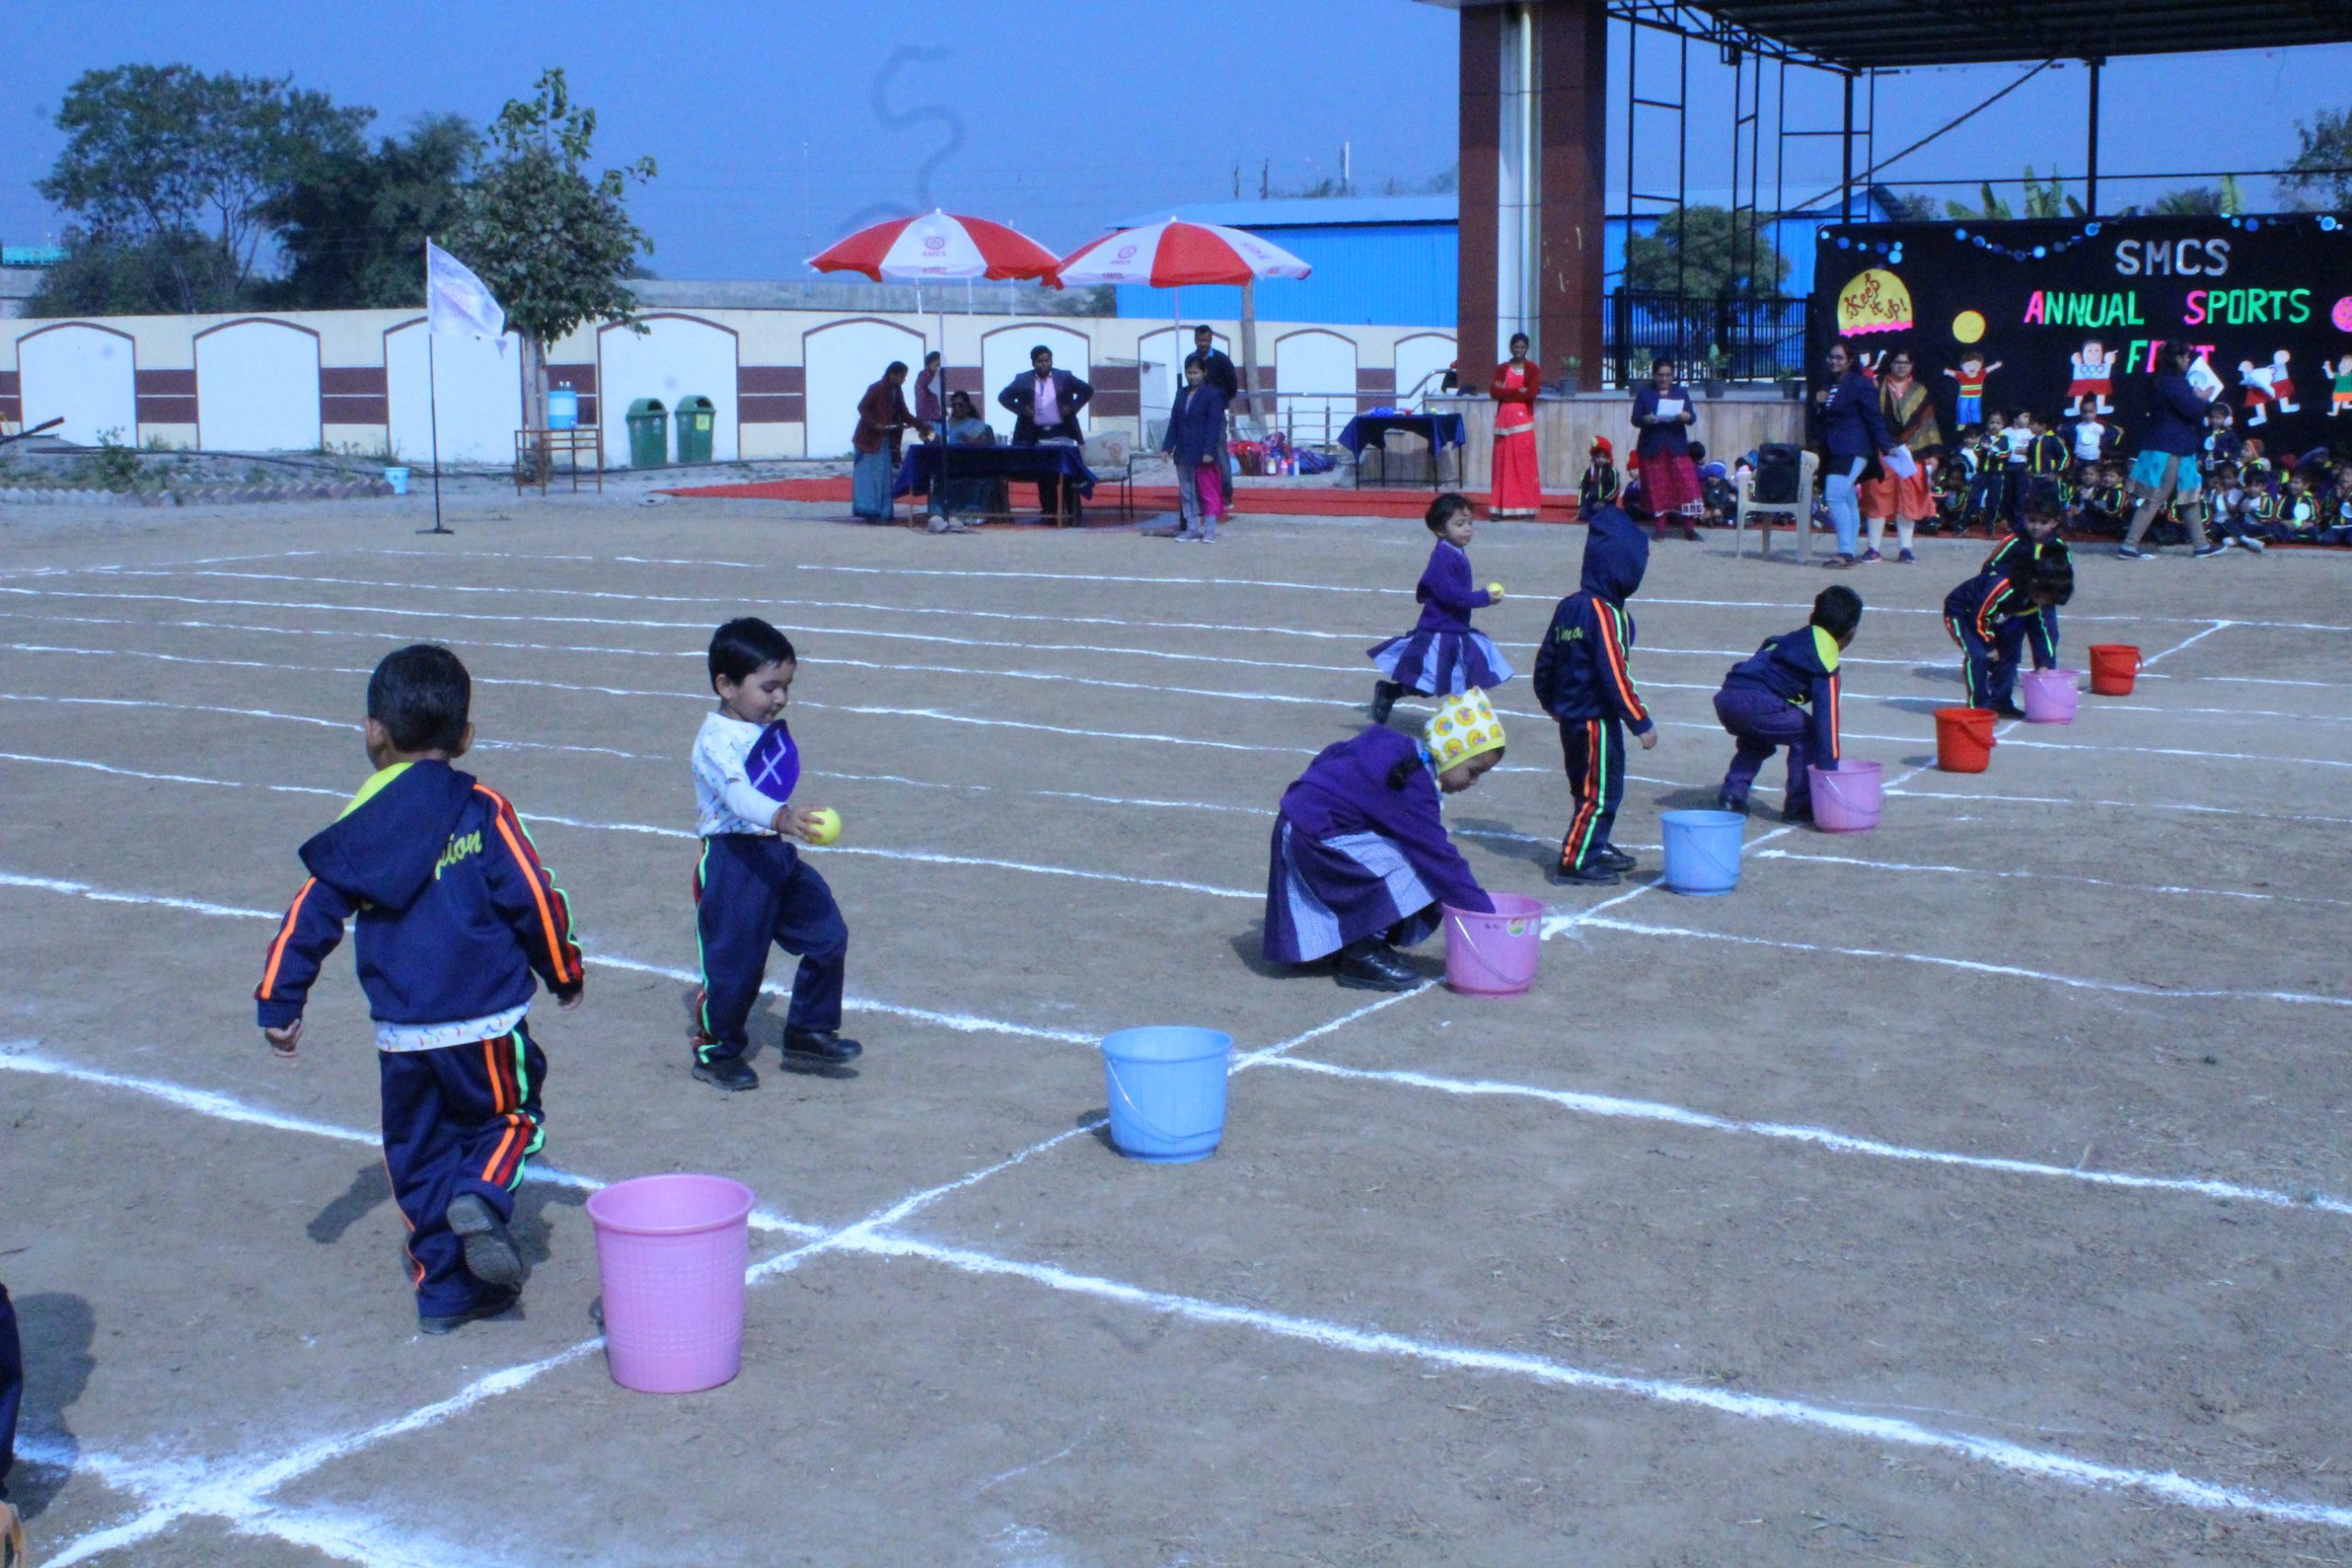 Annual Sports Fest